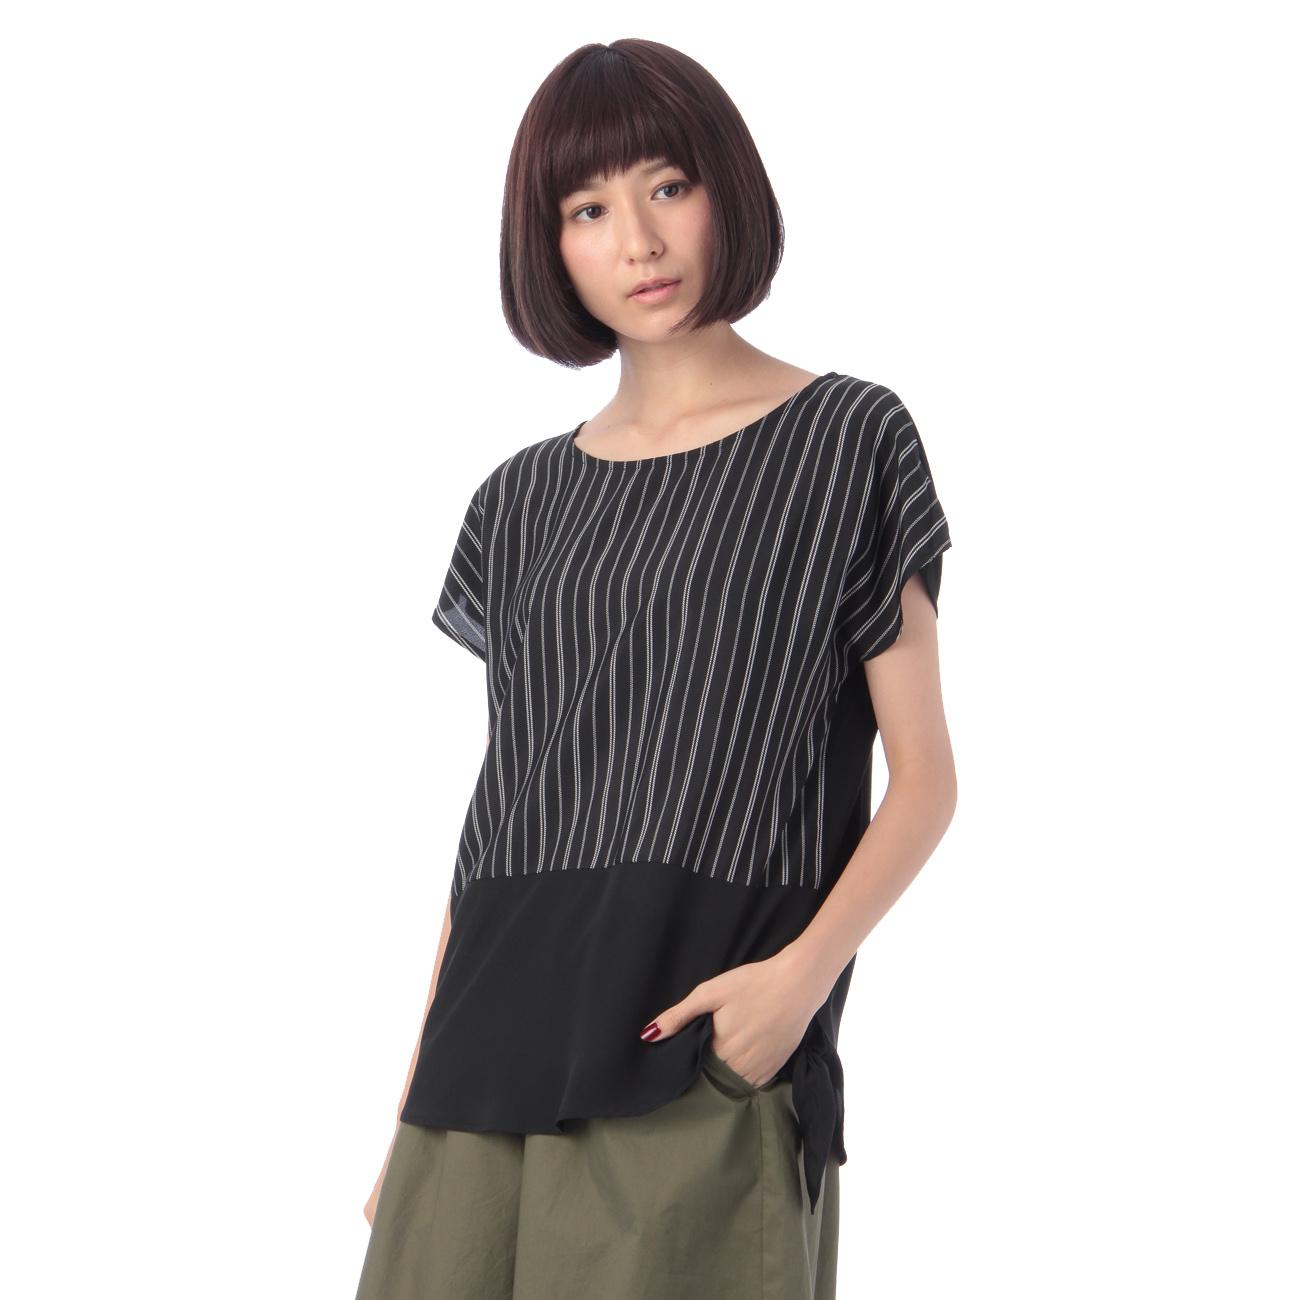 【grove (グローブ)】ストライプ裾横しばりプルオーバーレディース トップス|カットソー・Tシャツ ブラック